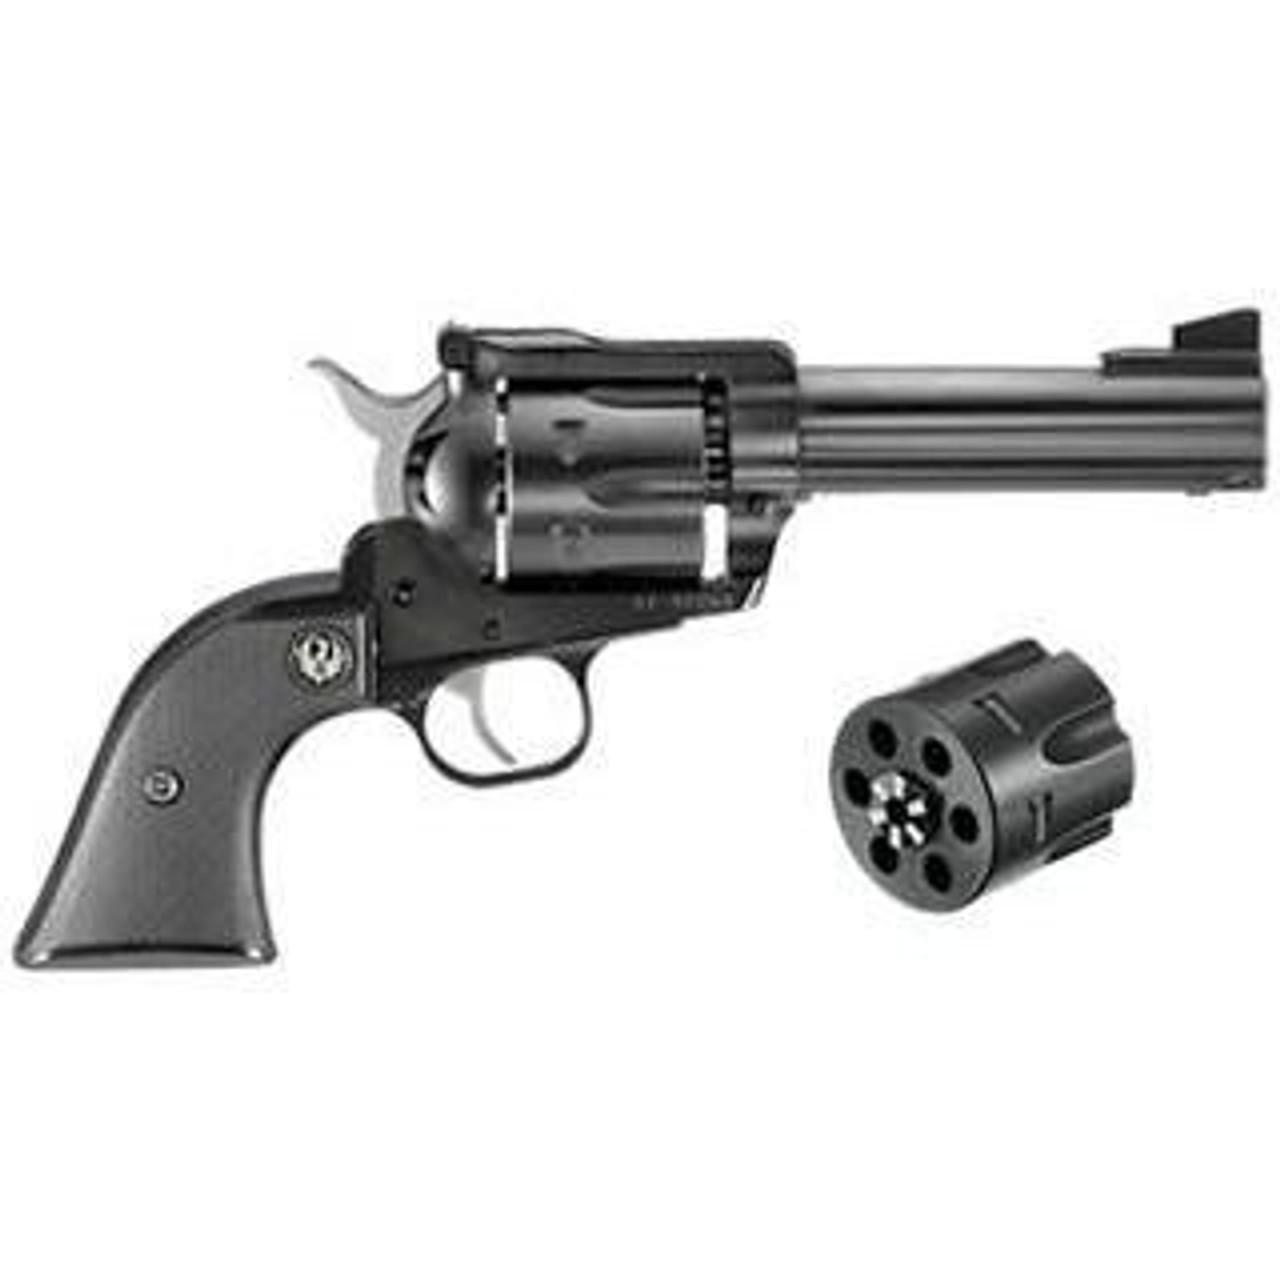 Ruger BlackHawk Convertible CALIFORNIA LEGAL- 9mm/.357